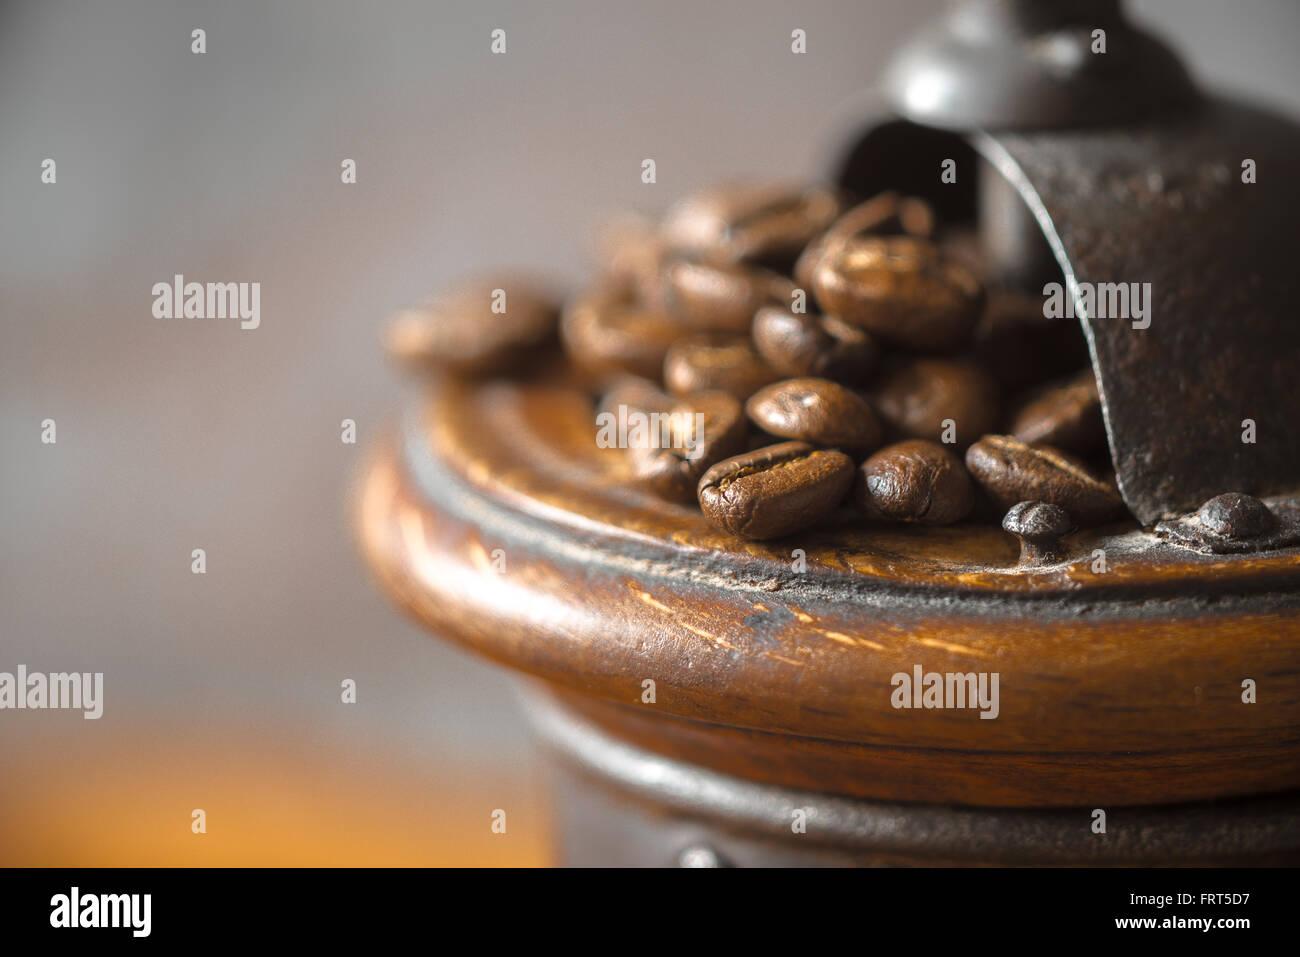 Kaffeemühle mit Kaffeebohnen Nahaufnahme Stockbild